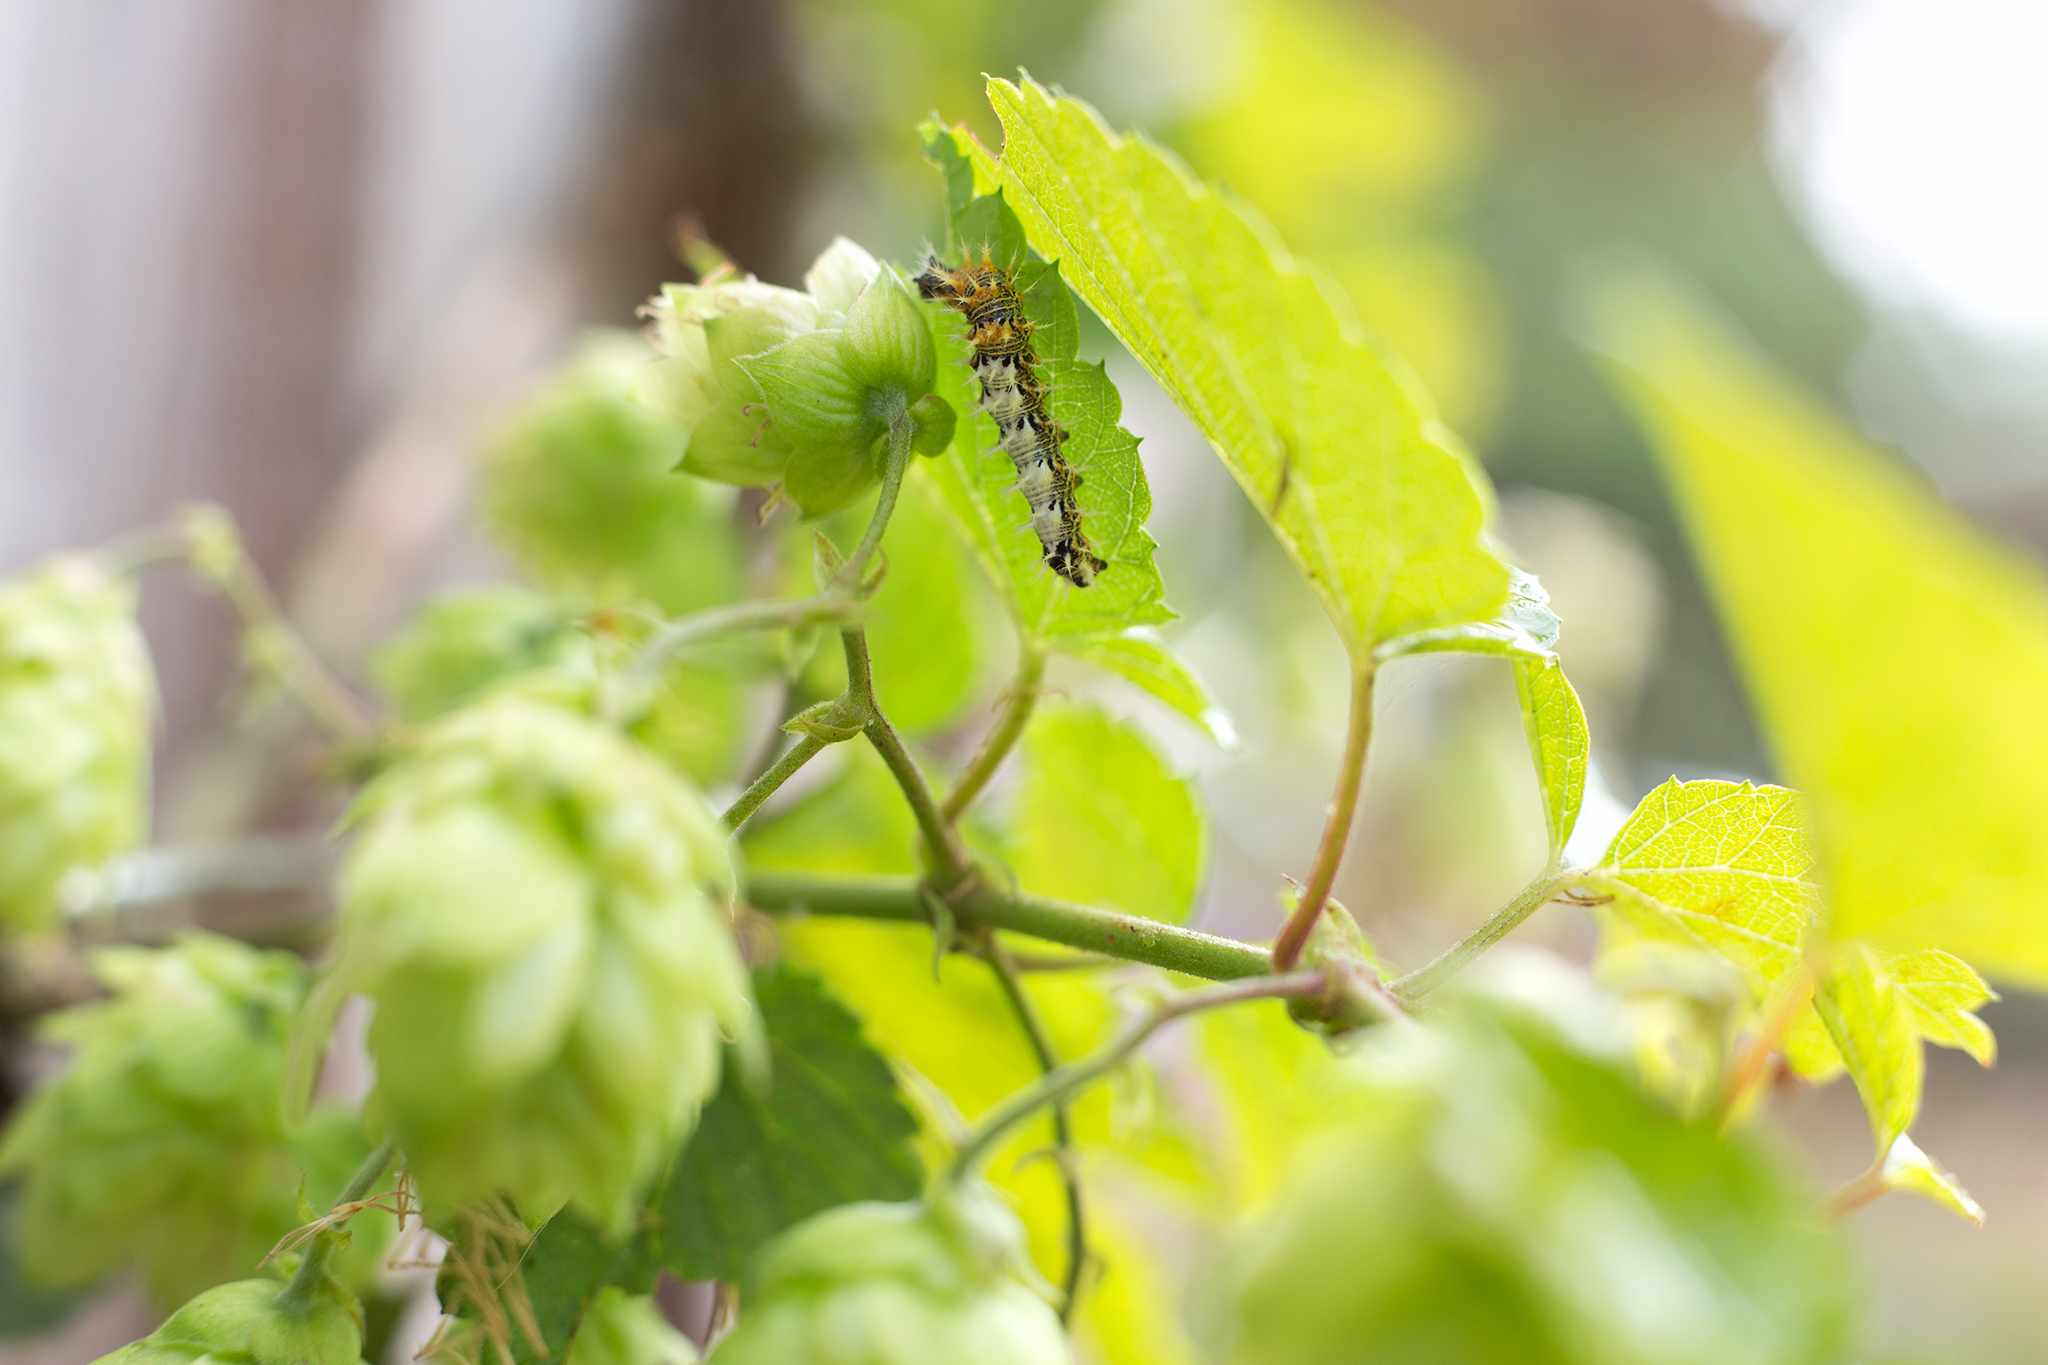 Comma butterfly caterpillar on hop (Humulus lupulus) foliage